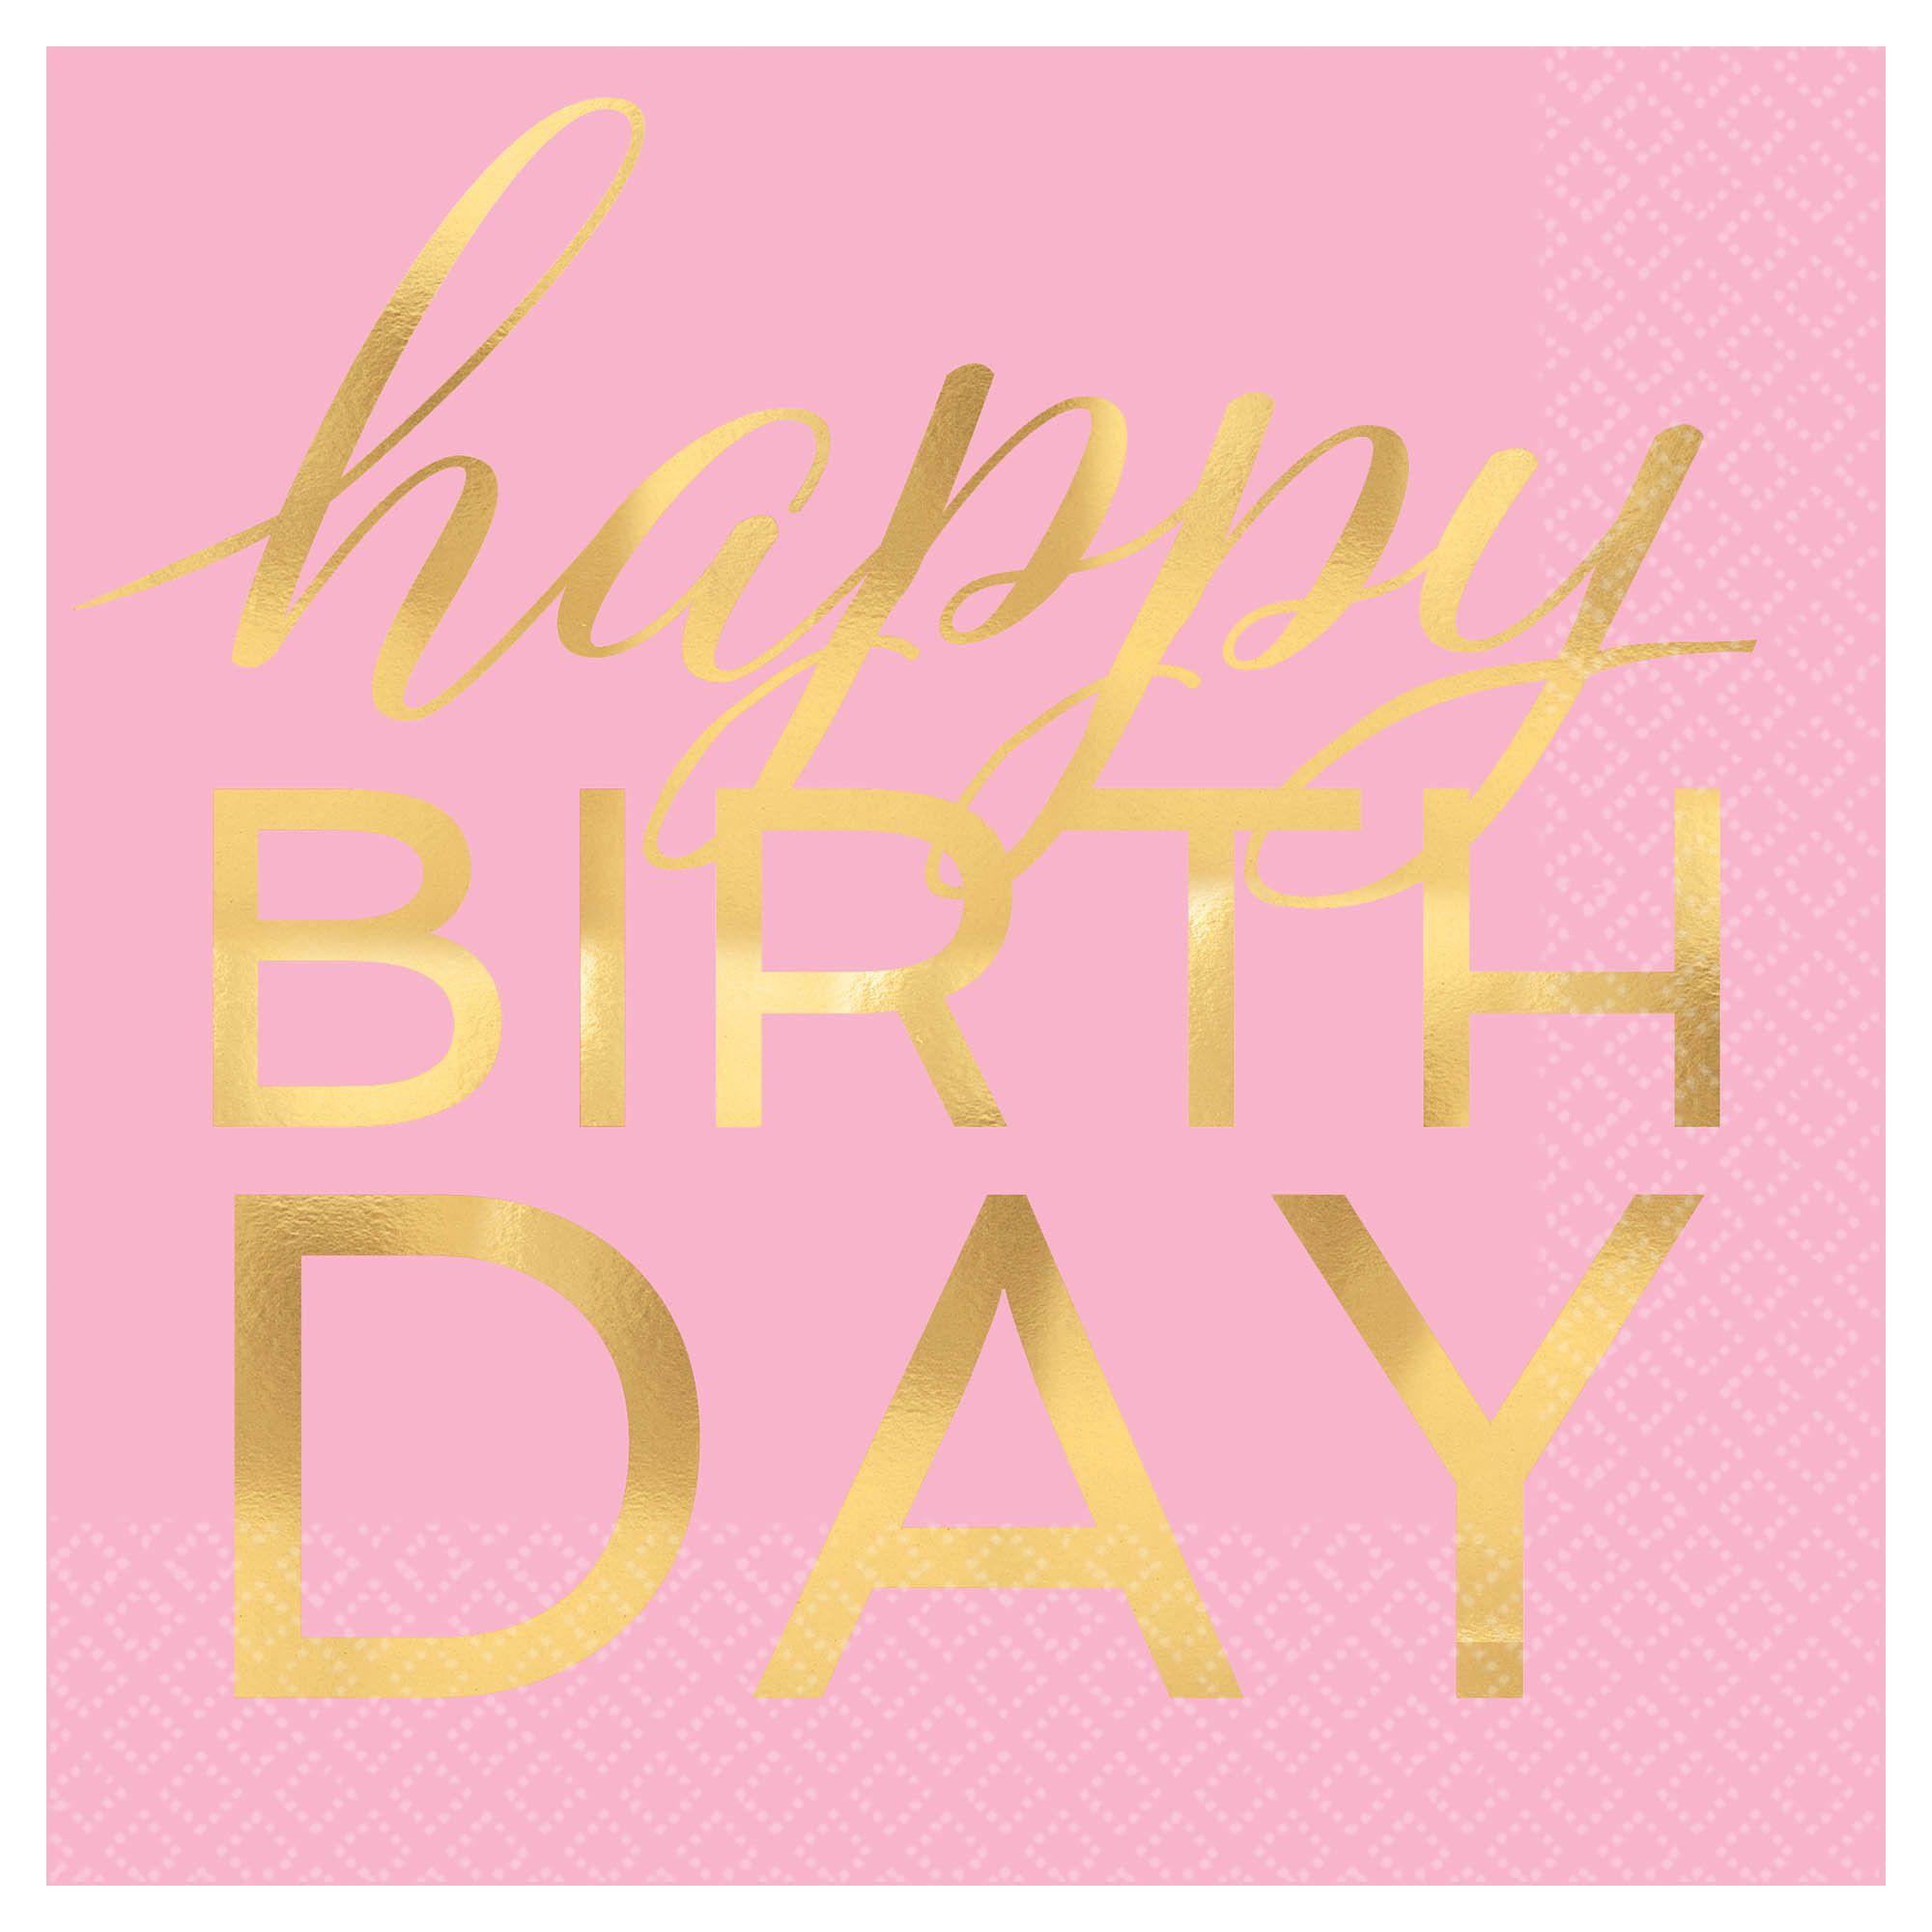 Happy Birthday LN